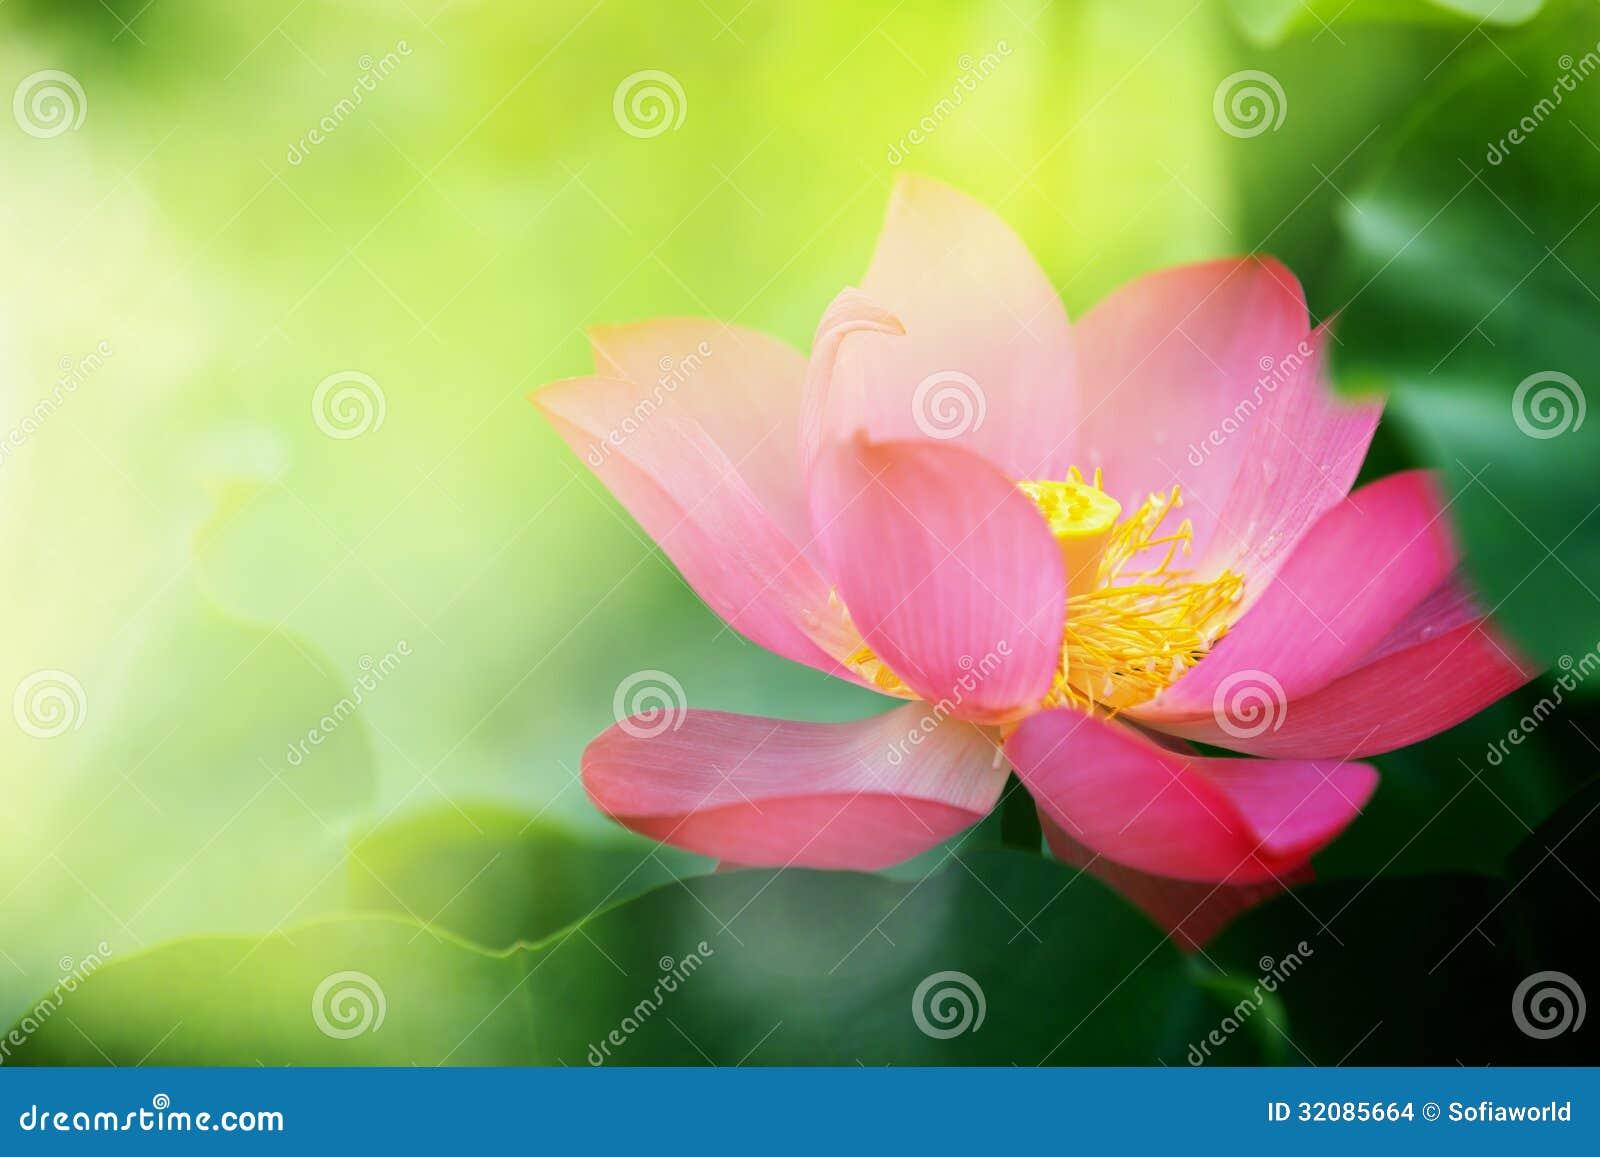 Lotus Stock Photo Image Of India Egypt Buddhism Nelumbo 32085664